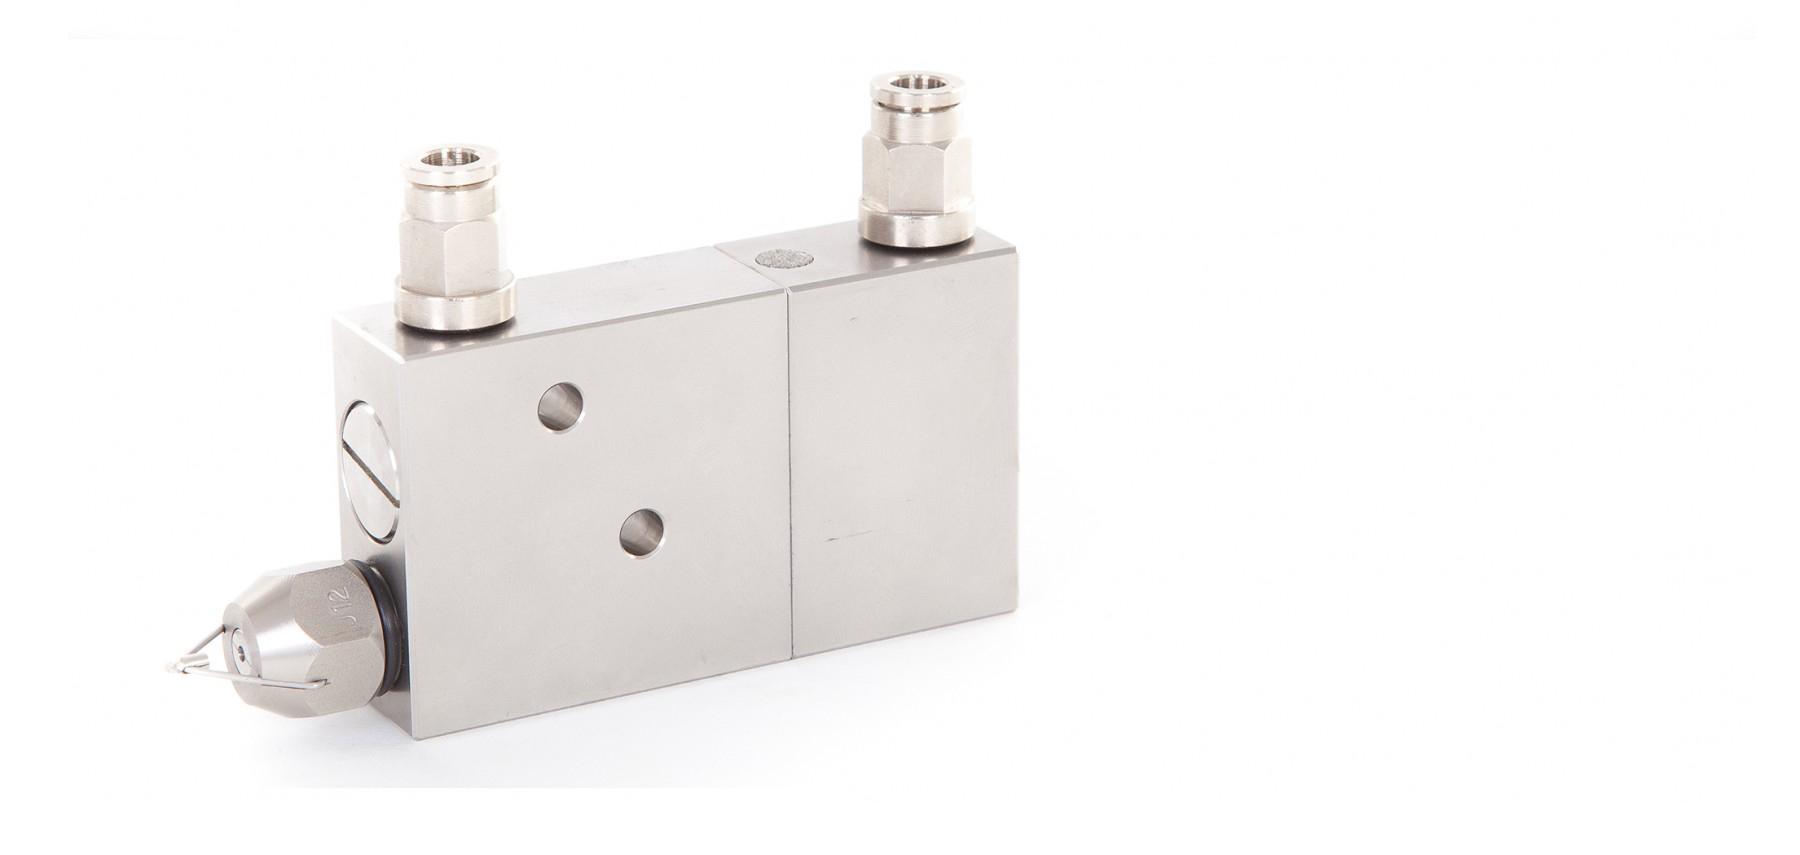 St47 Ultrasonic Spray Nozzle Spray Nozzles Ultrasonic